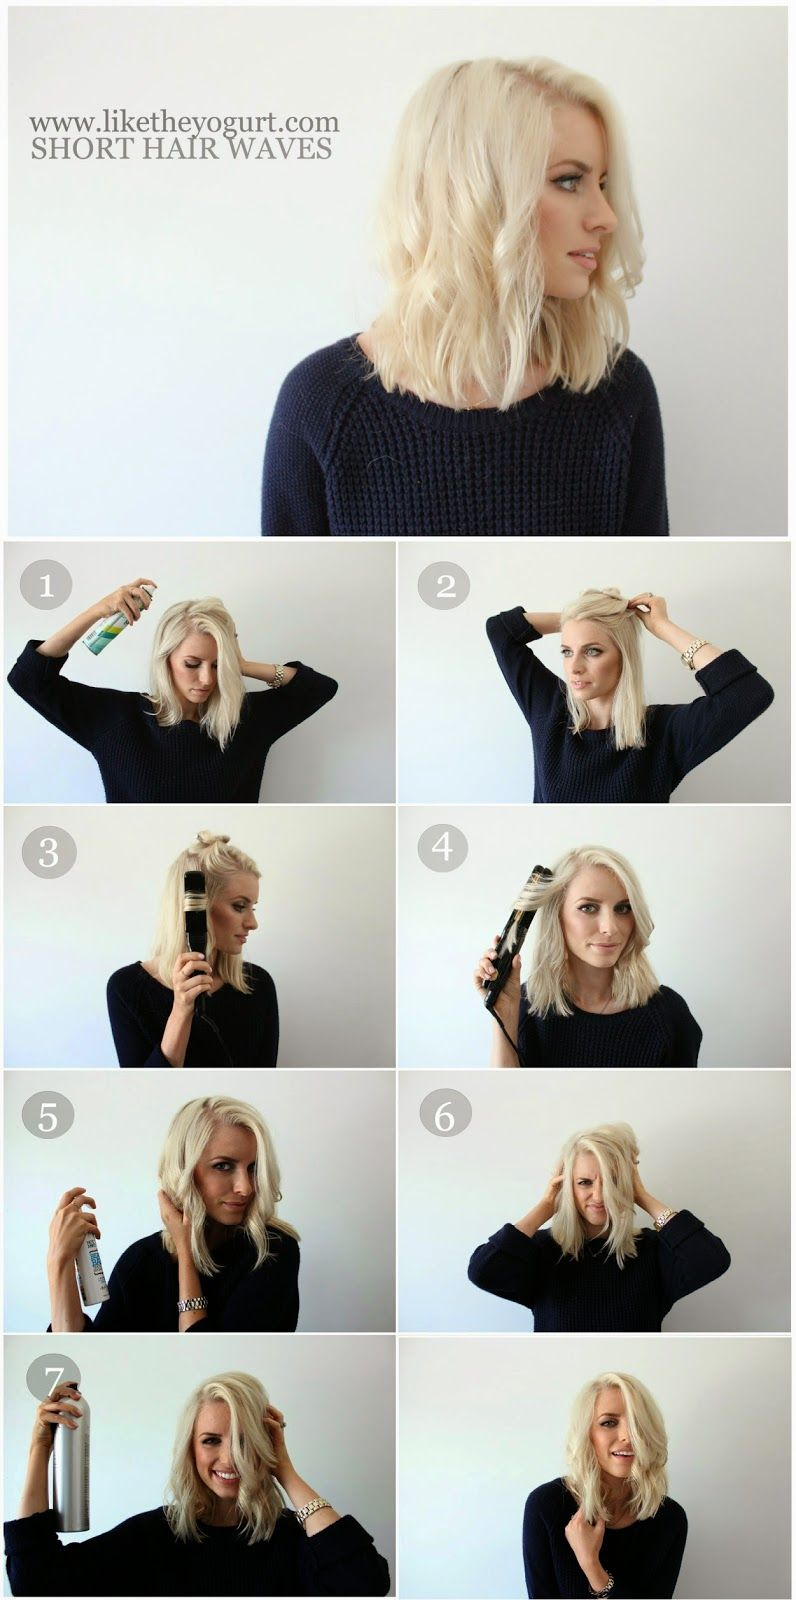 How to easy wavy hair tutorial for short hair like the yogurt